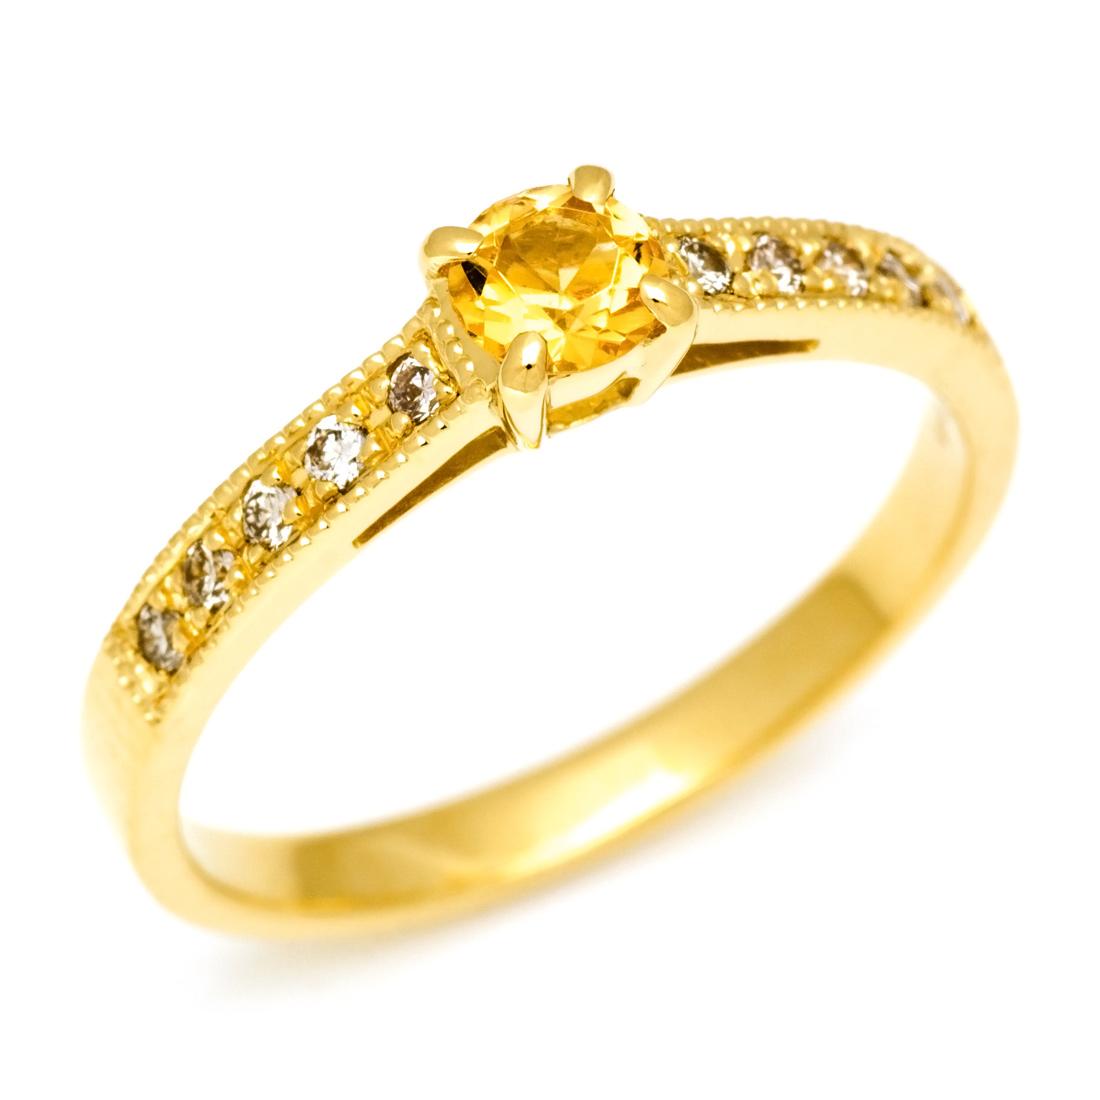 【GWクーポン配布中】K18 インペリアルトパーズ ダイヤモンド リング 「fiorito」送料無料 指輪 ゴールド 18K 18金 誕生日 11月誕生石 ミル打ち 刻印 文字入れ メッセージ ギフト 贈り物 ピンキーリング対応可能